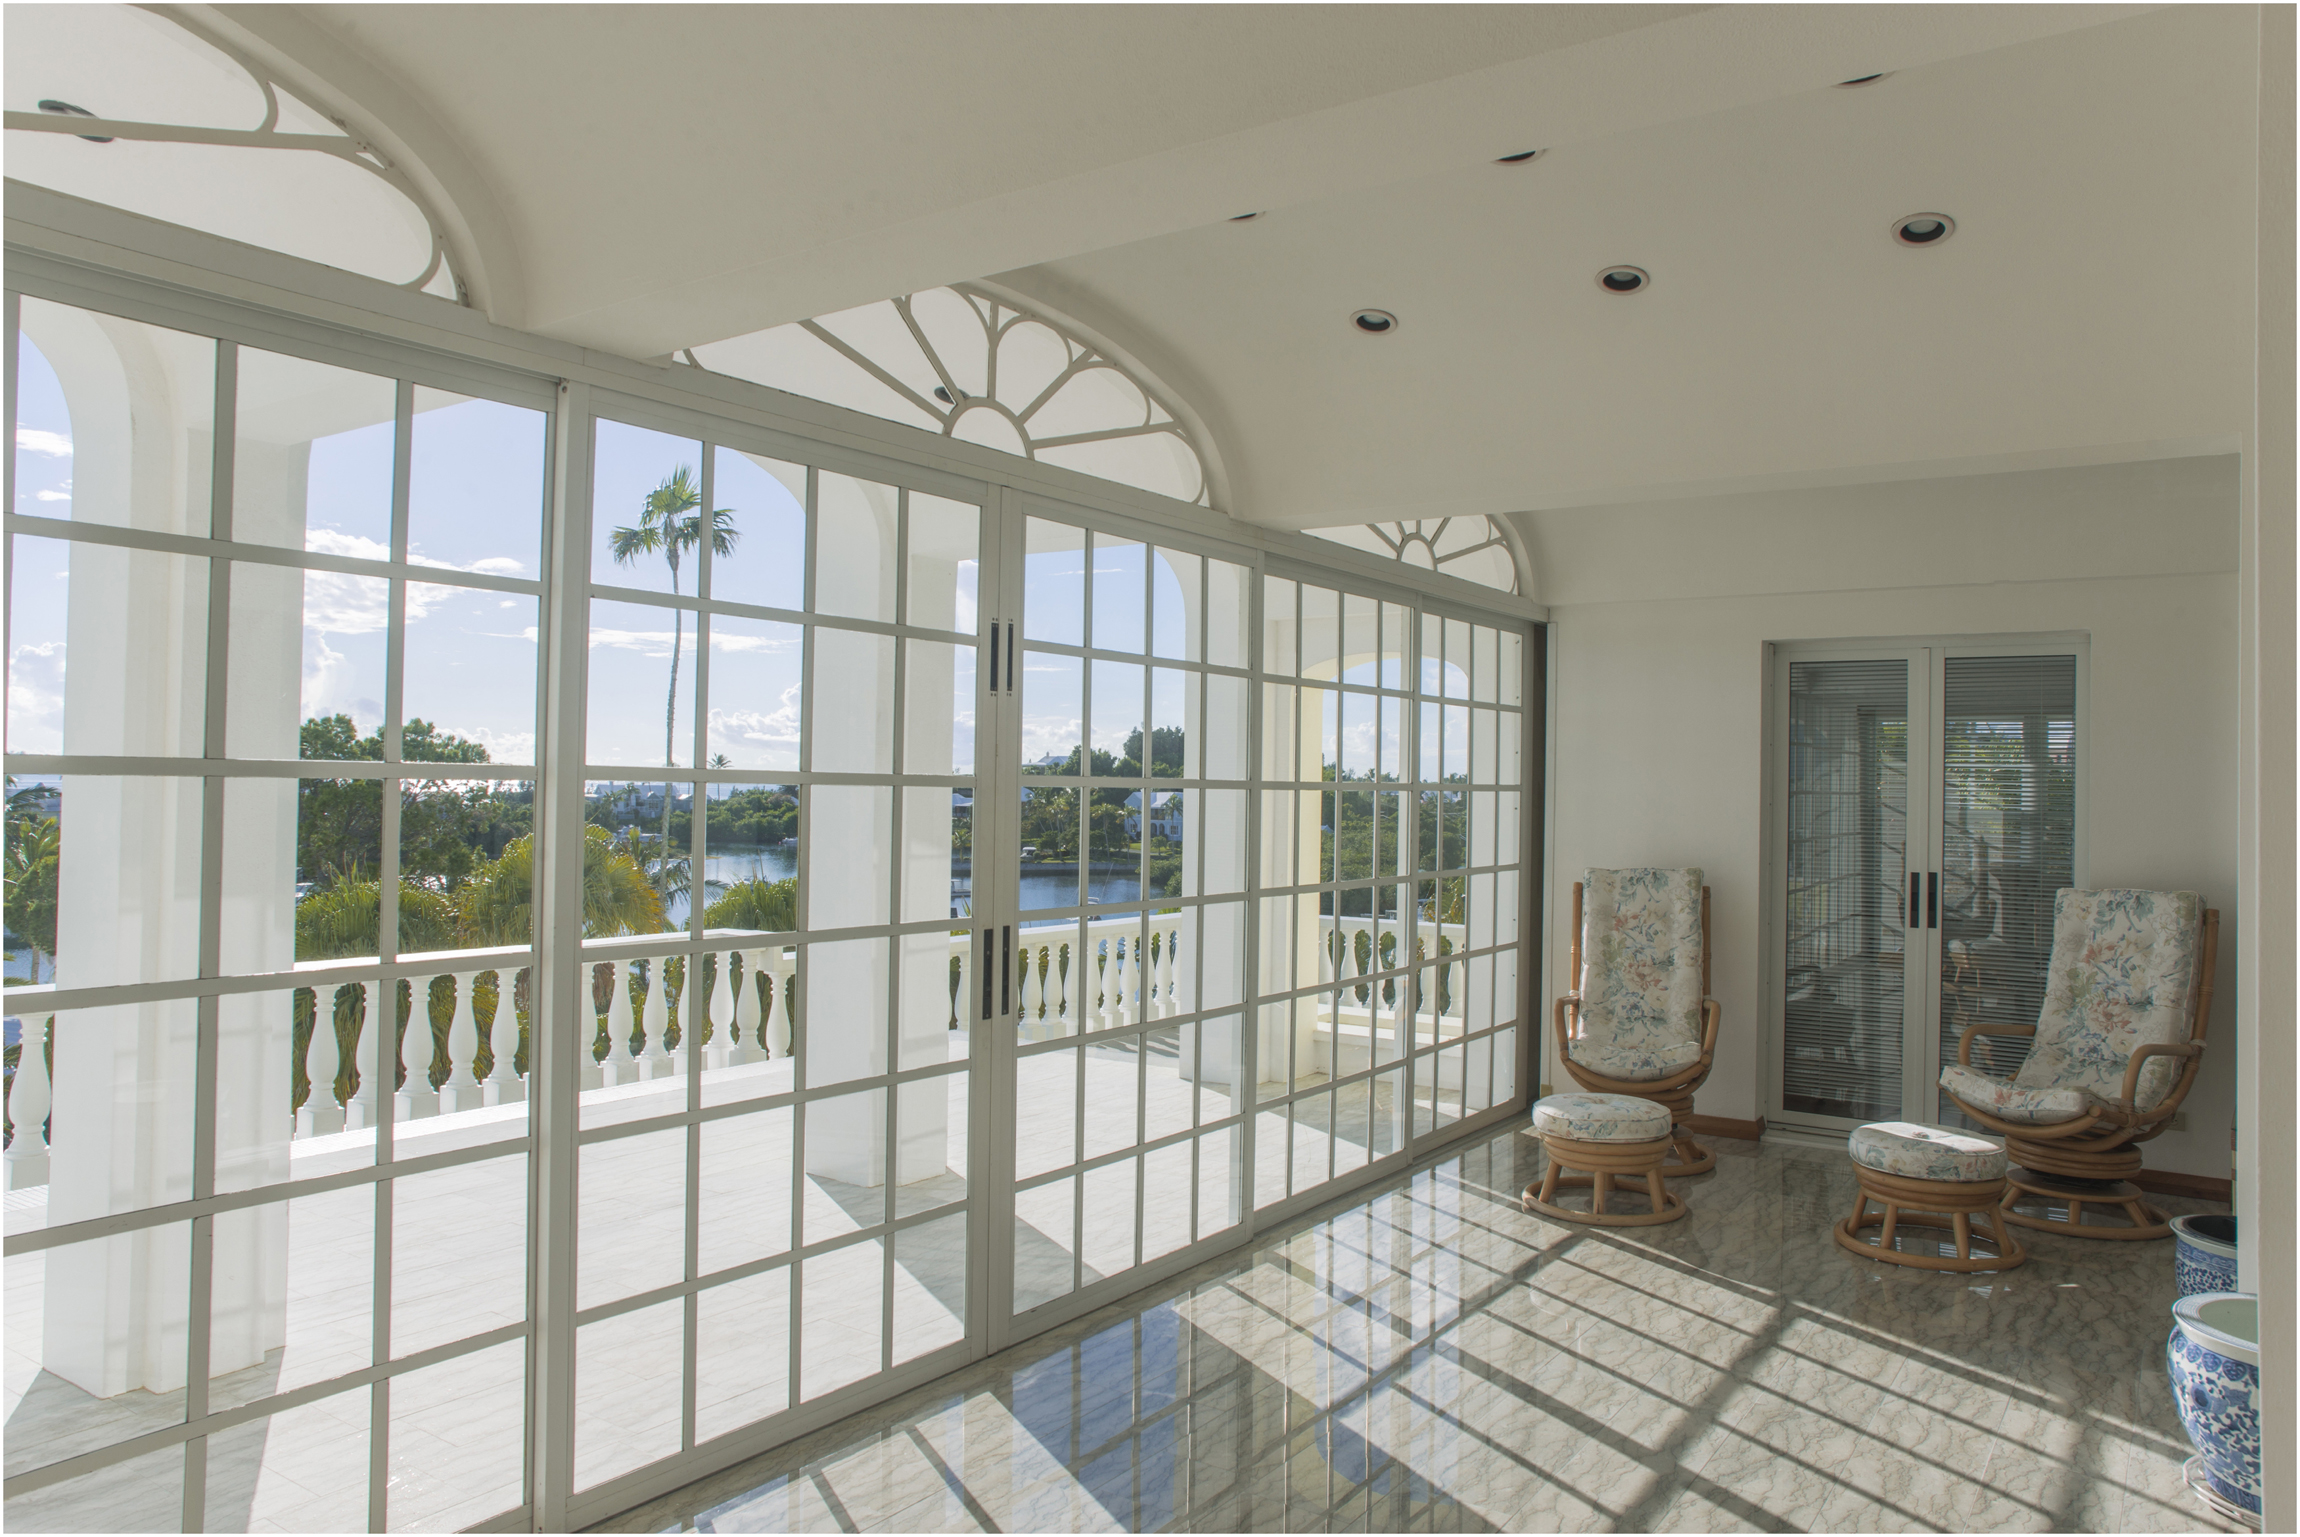 ©FianderFoto_Architecture_Bermuda_Palomera_008.jpg